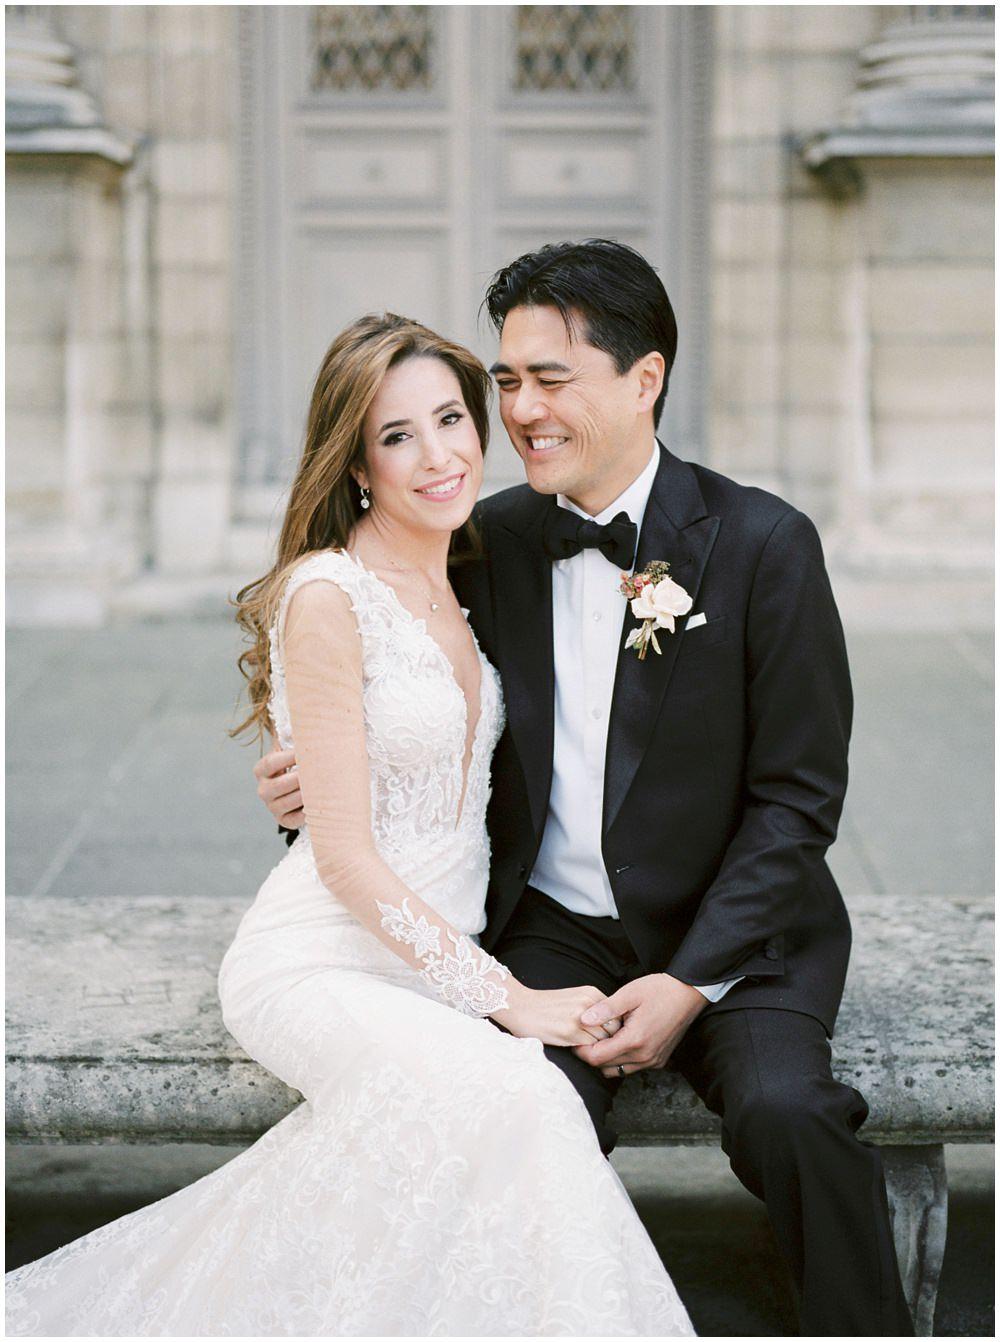 Paris Elopement Wedding At Hotel Plaza Athenee In 2020 Paris Wedding Fox Wedding Elope Wedding